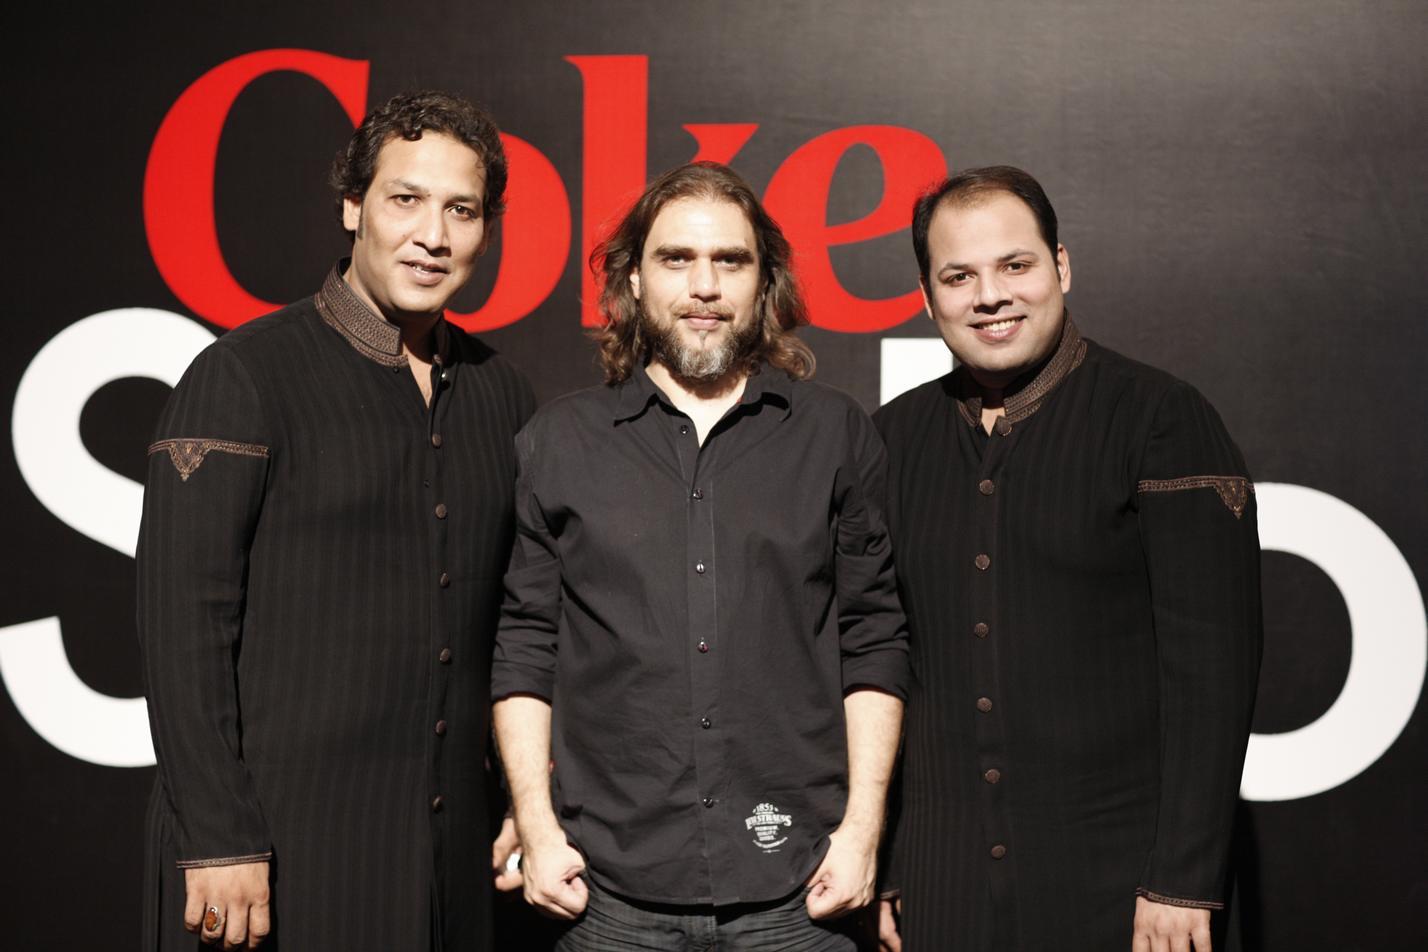 Rohail Hyat with Rizwan and Moazam